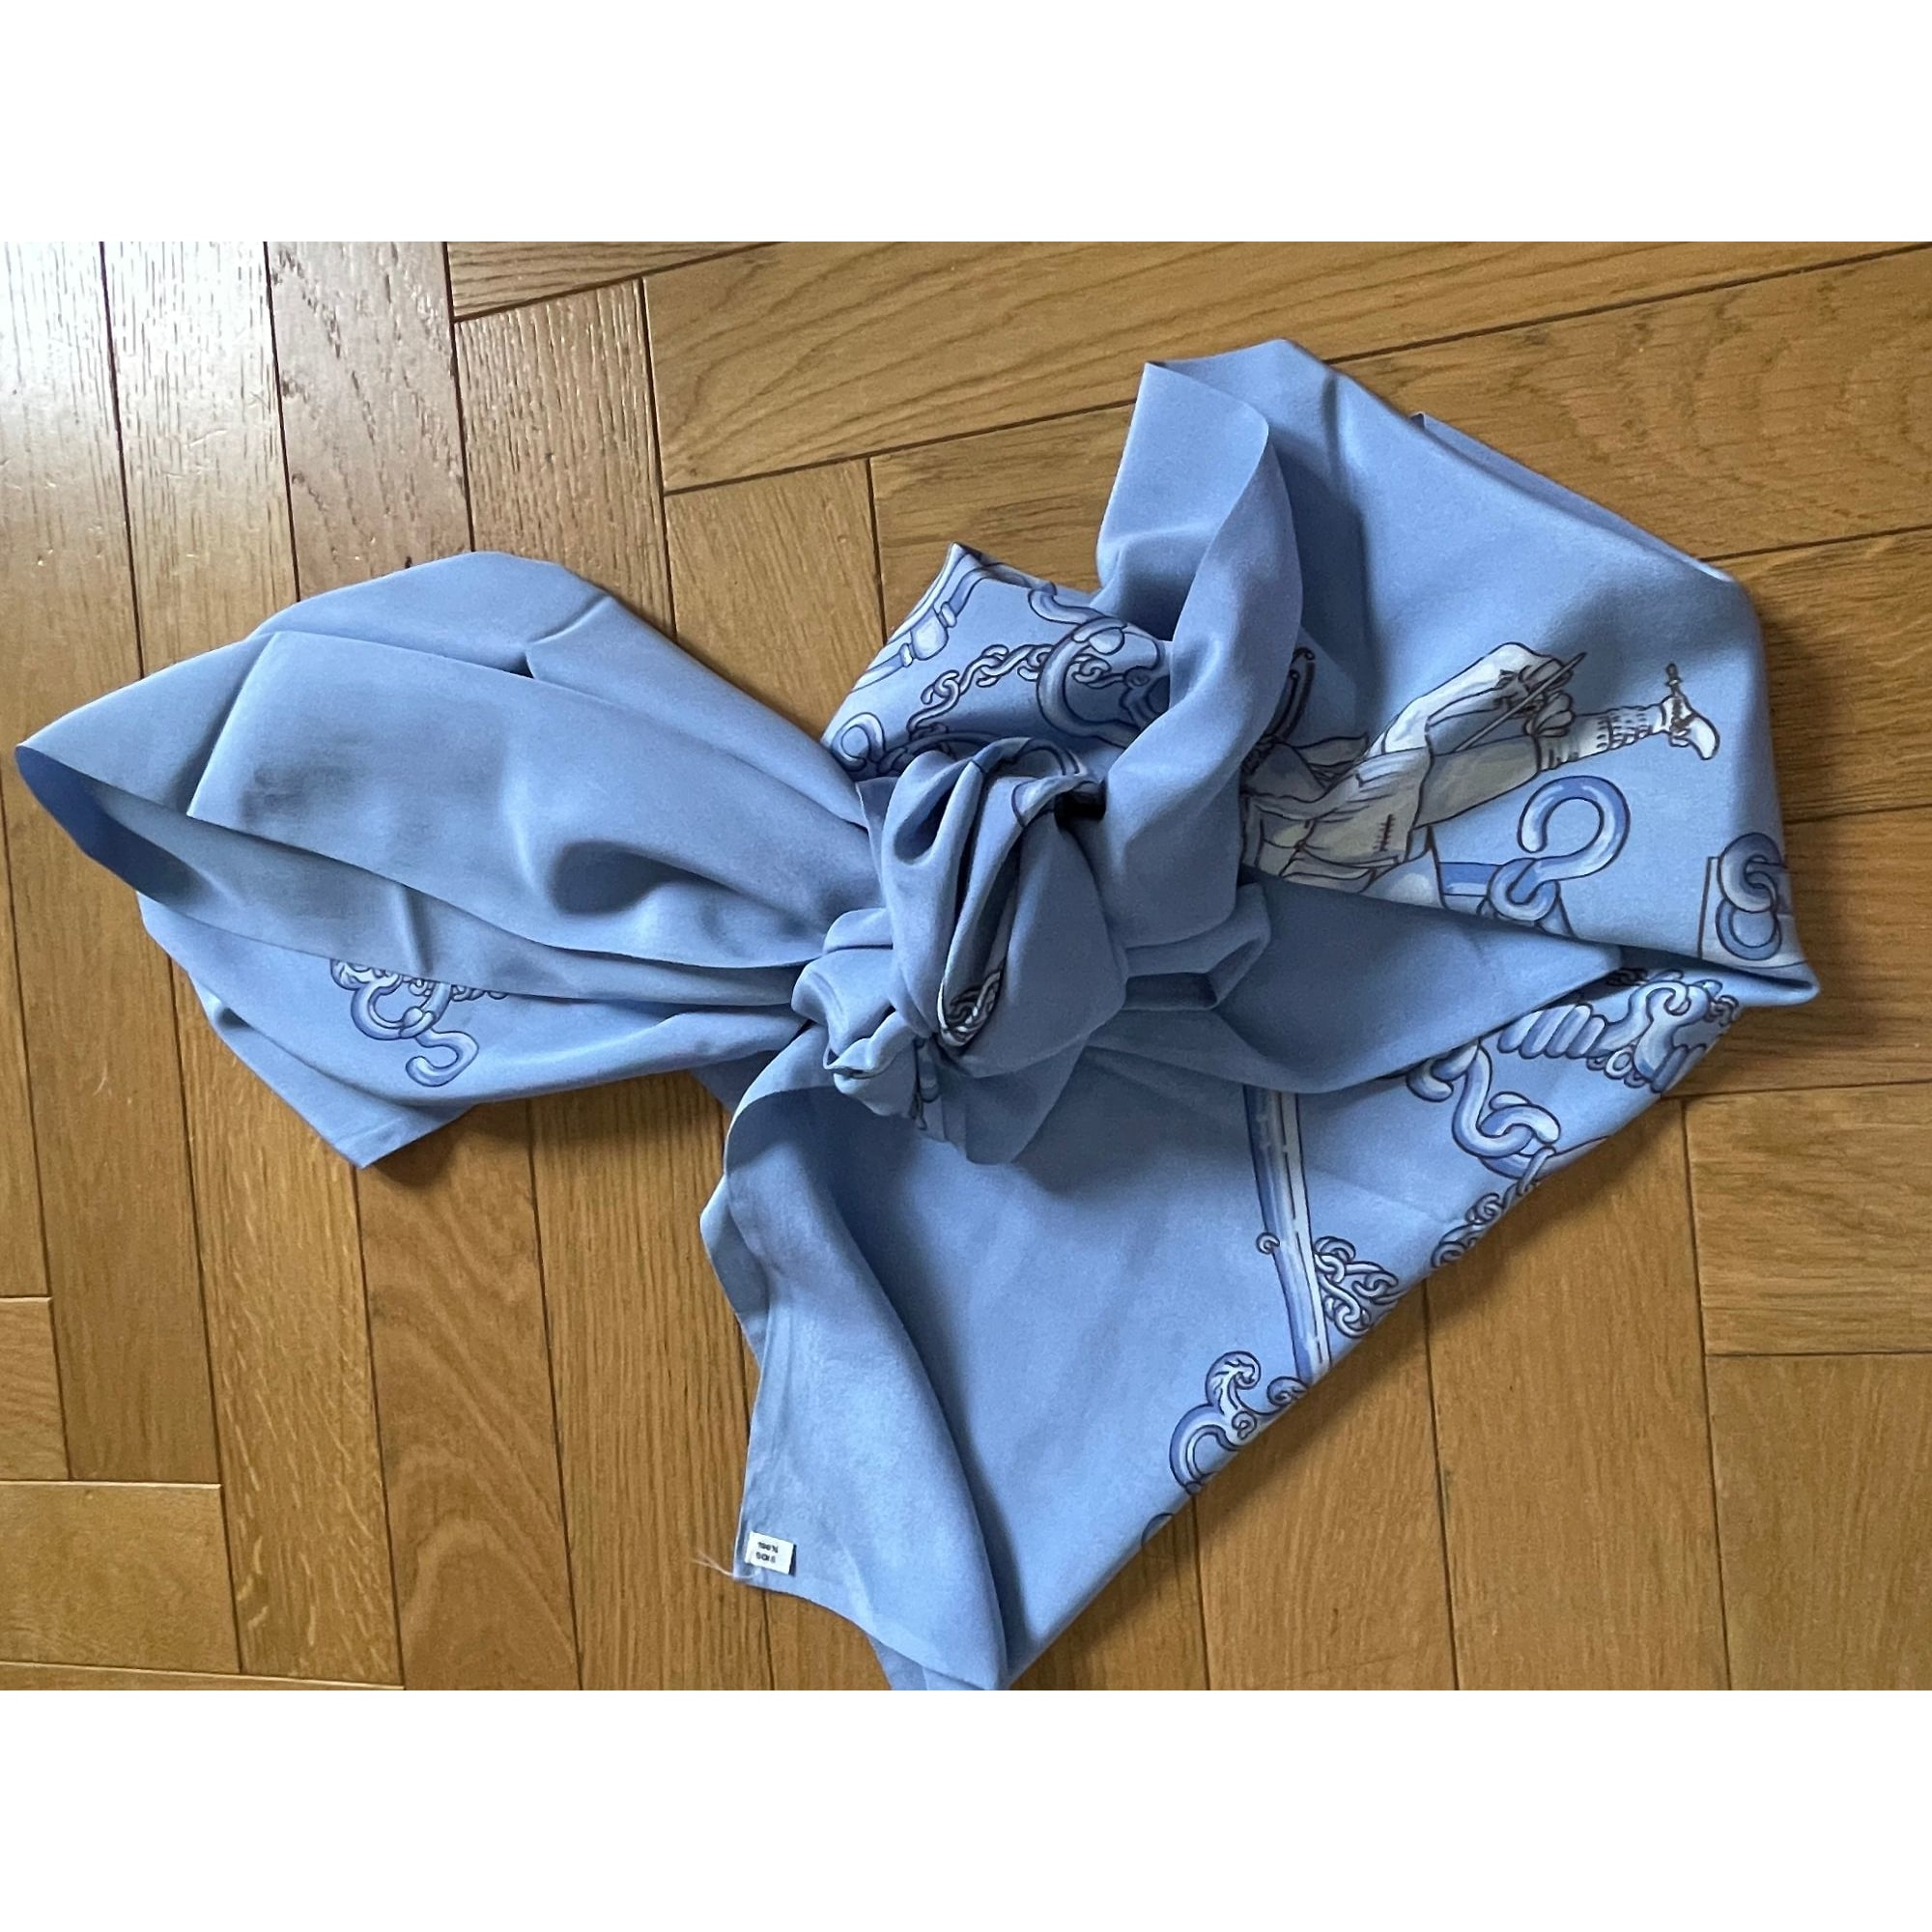 Etole HERMÈS Bleu, bleu marine, bleu turquoise